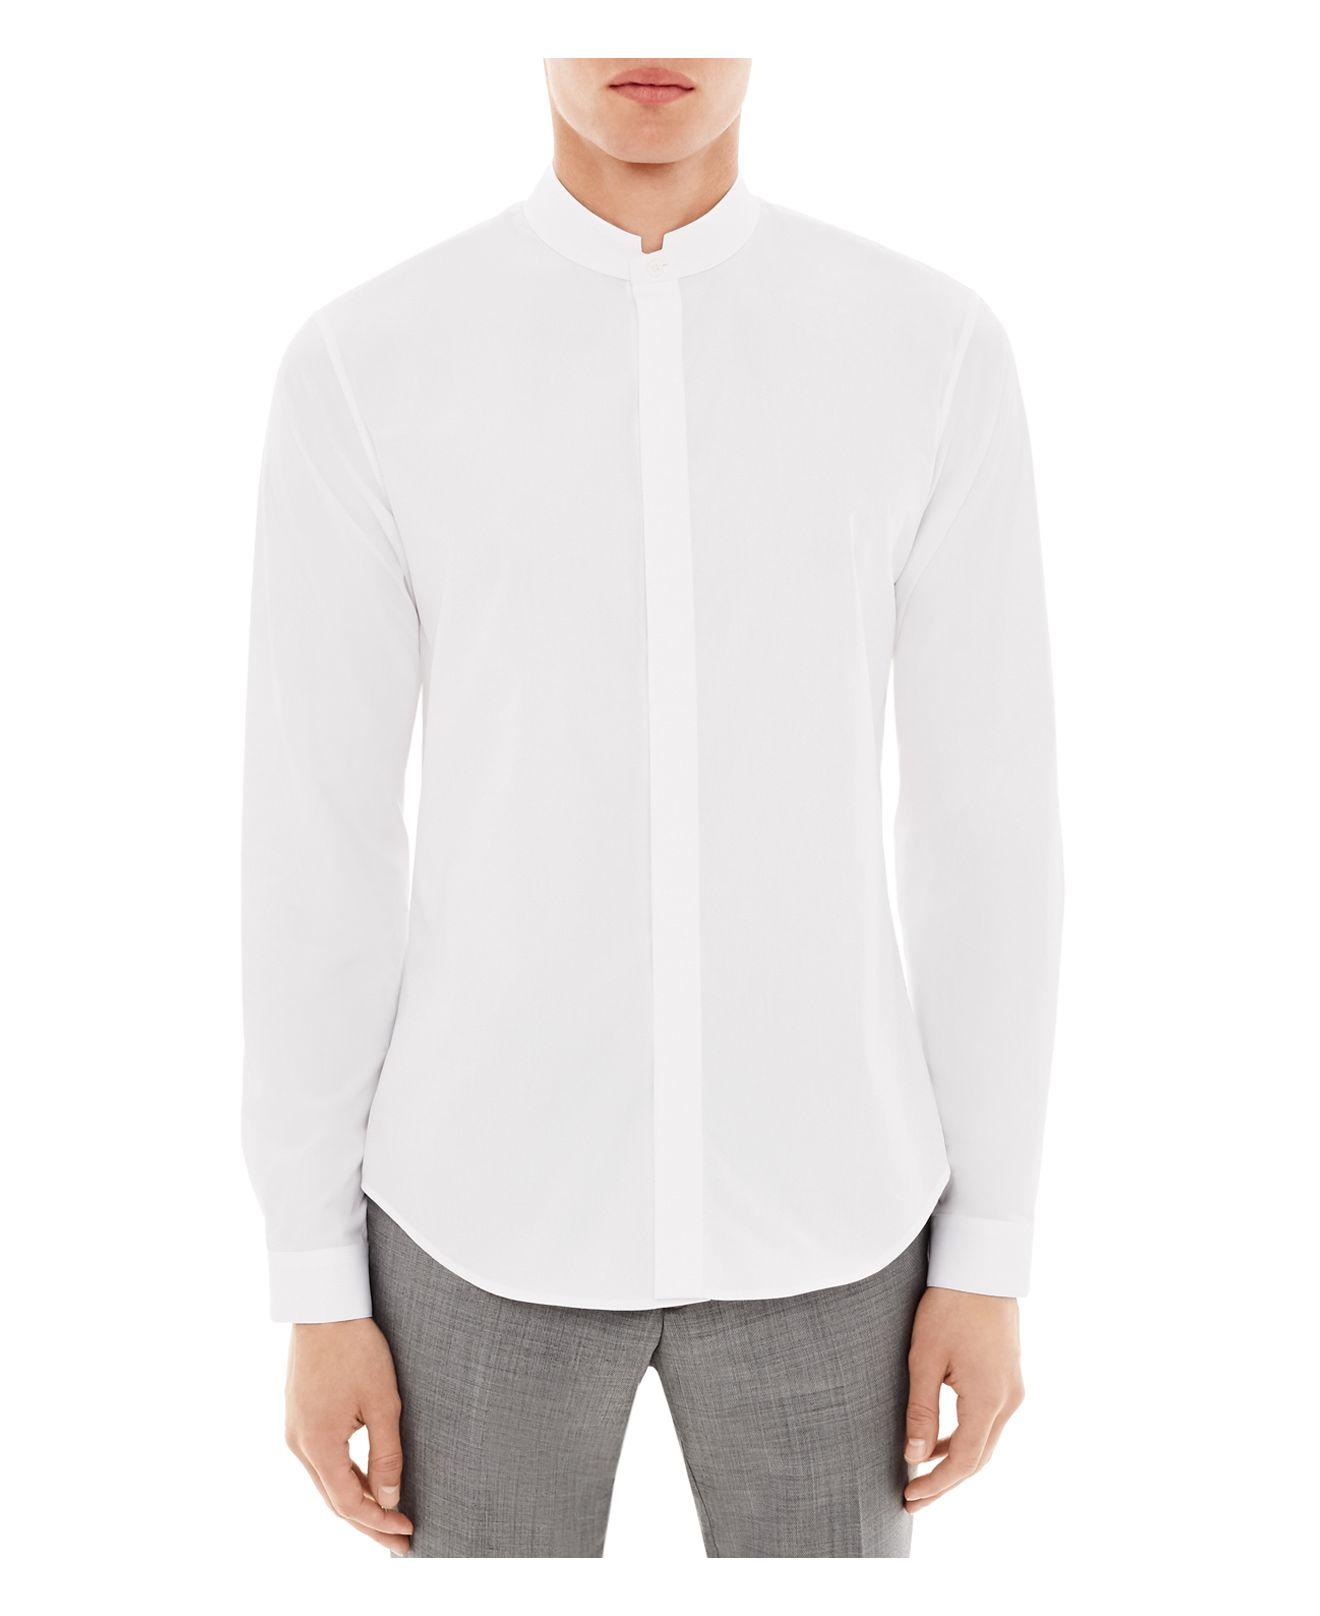 Lyst sandro accord slim fit button down shirt in white for Slim fit white button down shirt